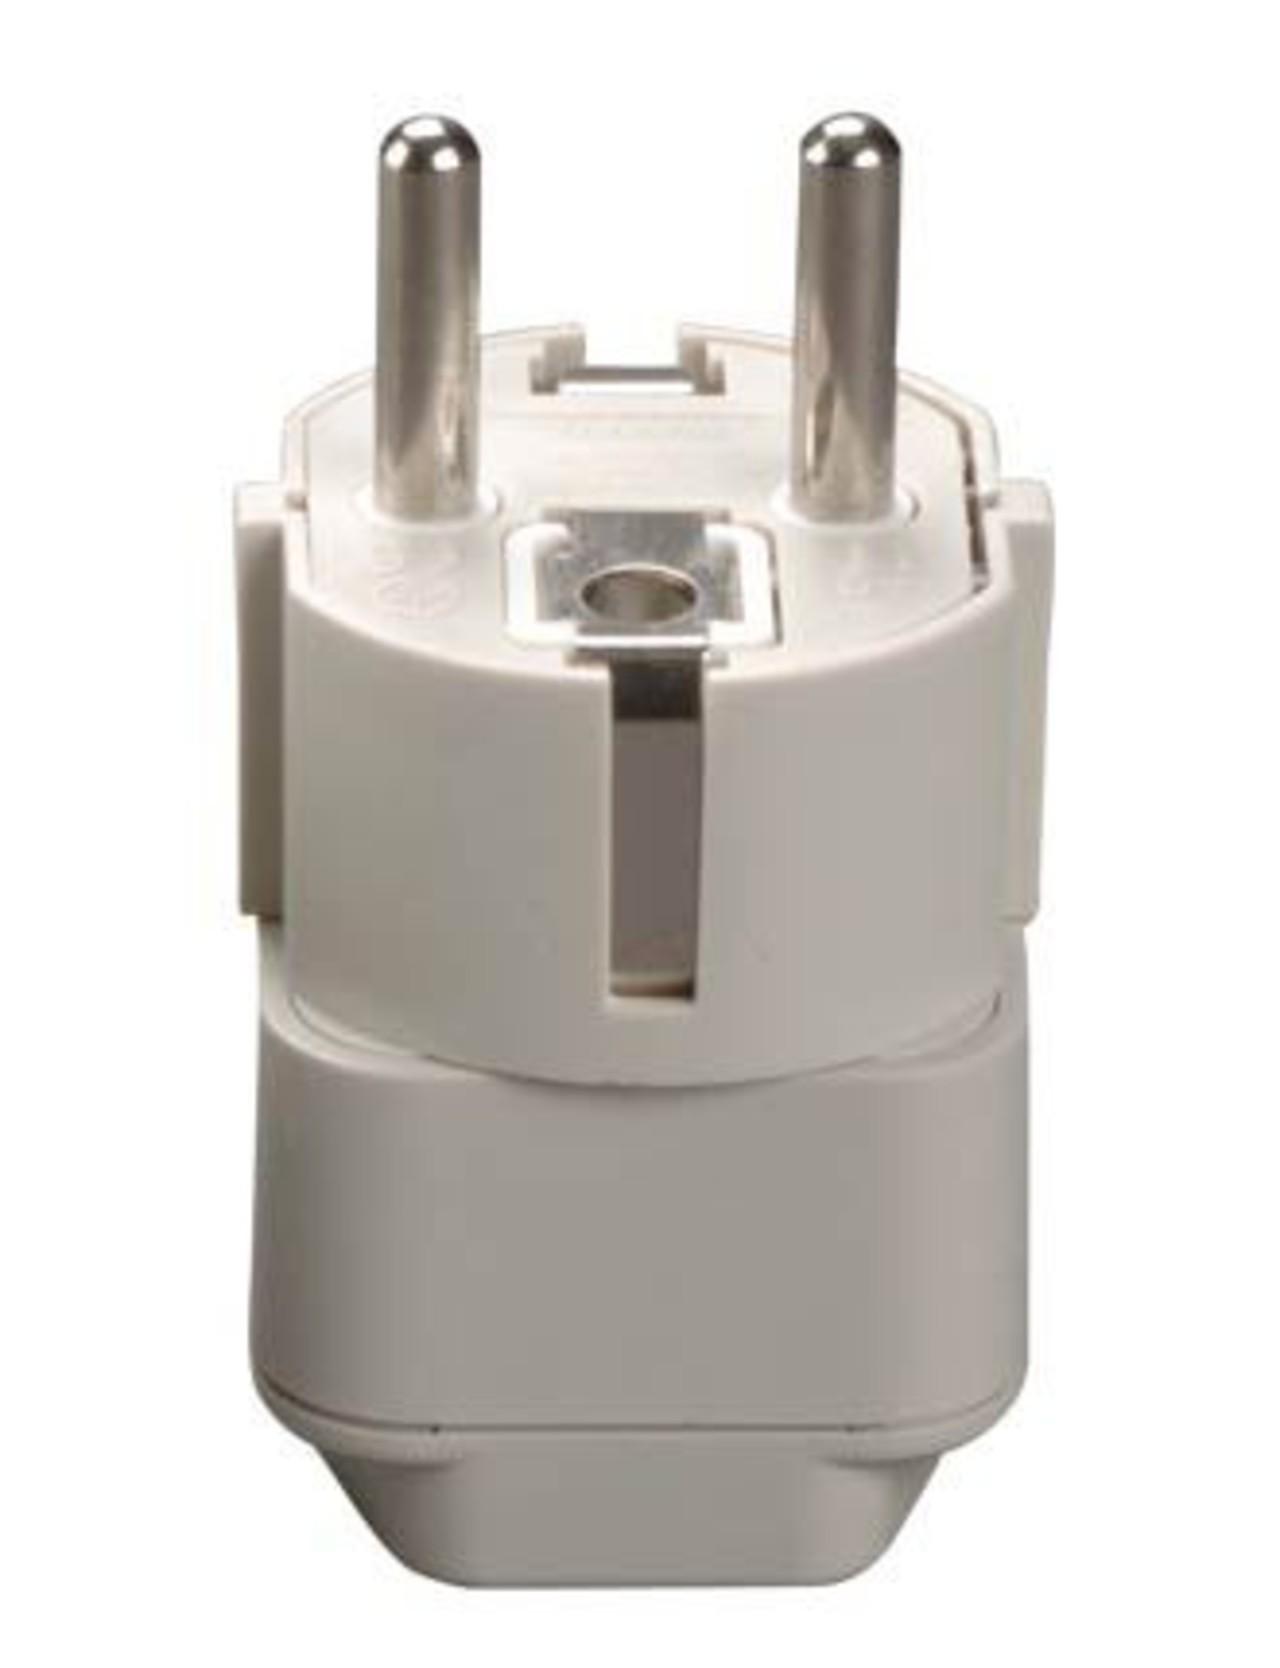 Icelandic electrical adaptor